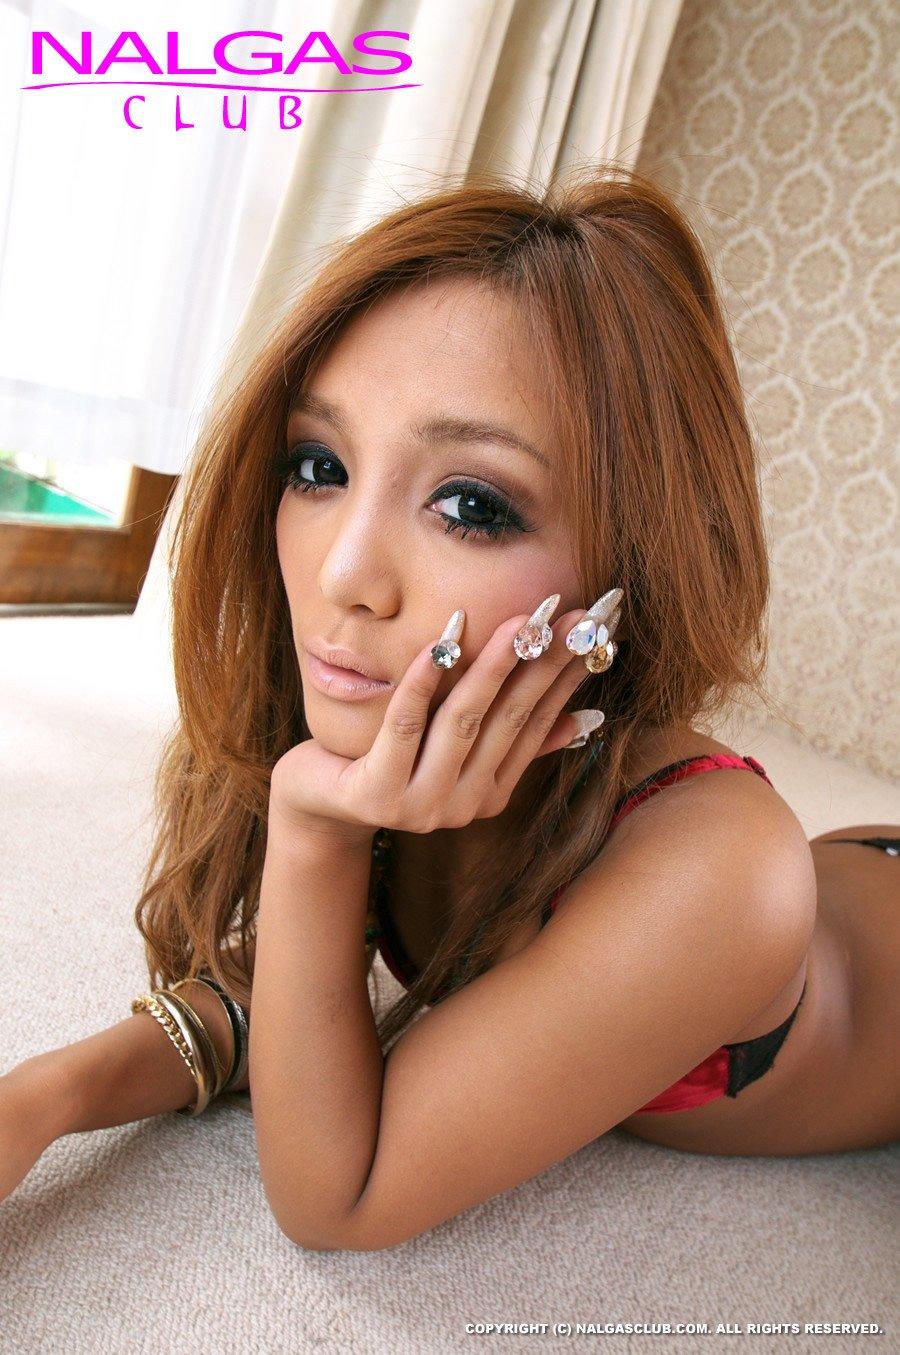 Japanese Porn5 big fat teen nude, teen boobs naked nude boobs pussy of plump women